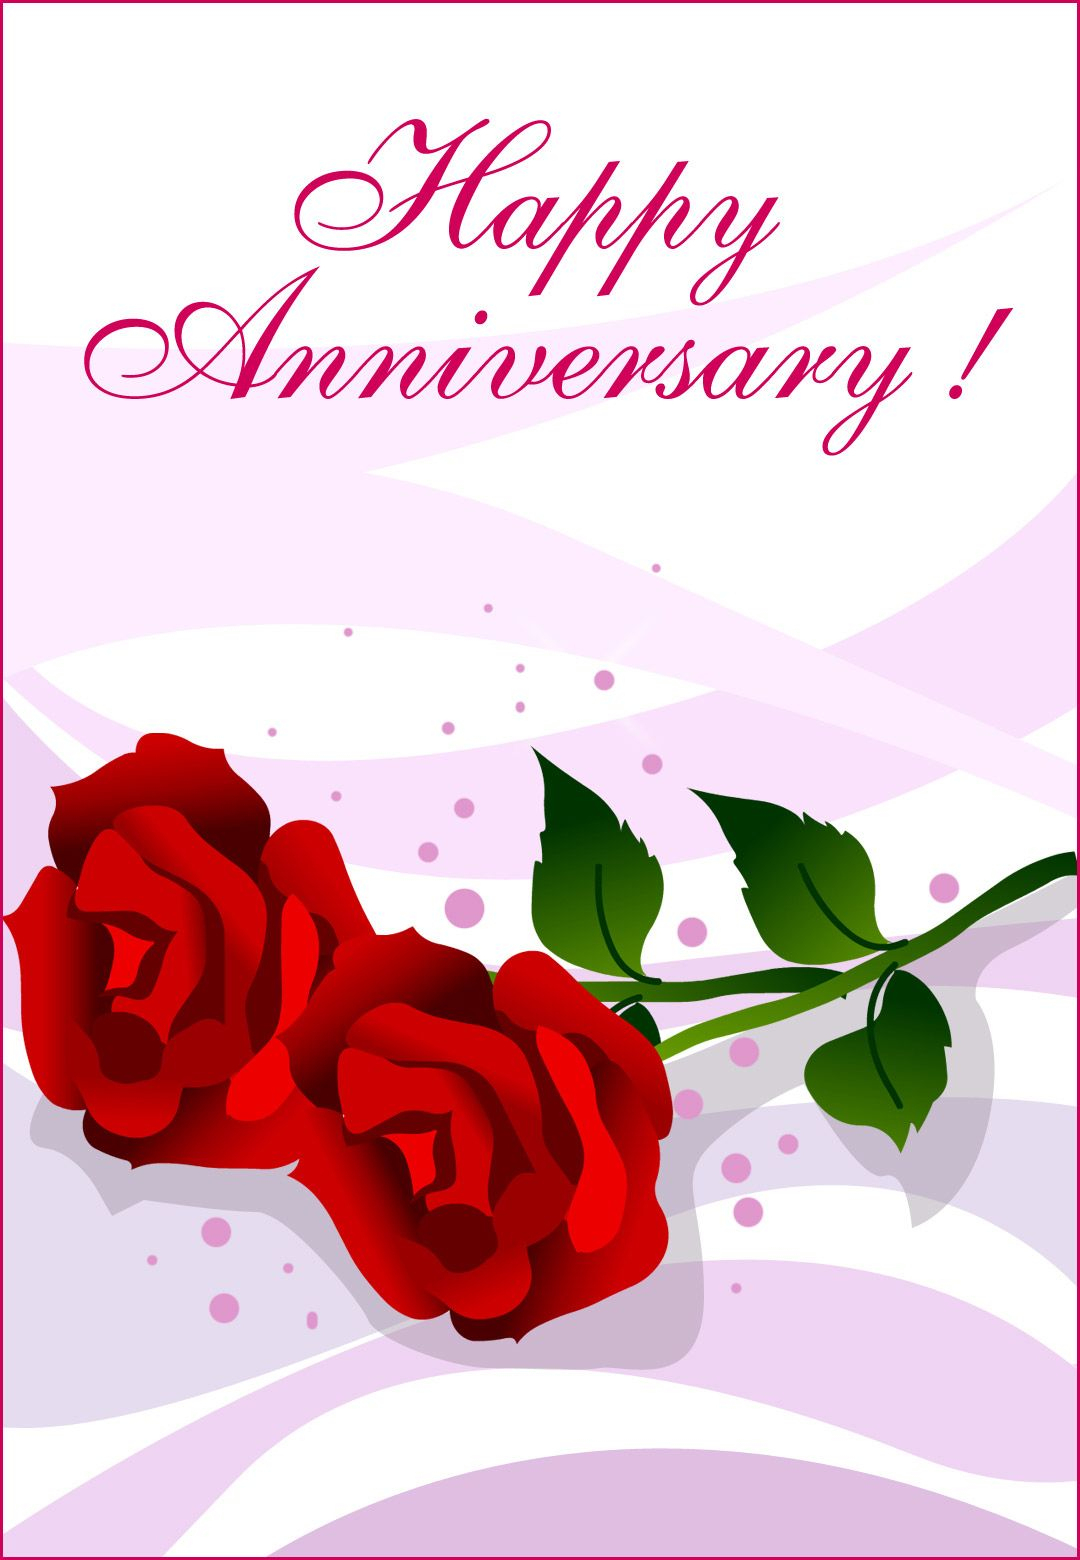 Free Printable Happy Anniversary Greeting Card | Name | Pinterest - Free Printable Anniversary Cards